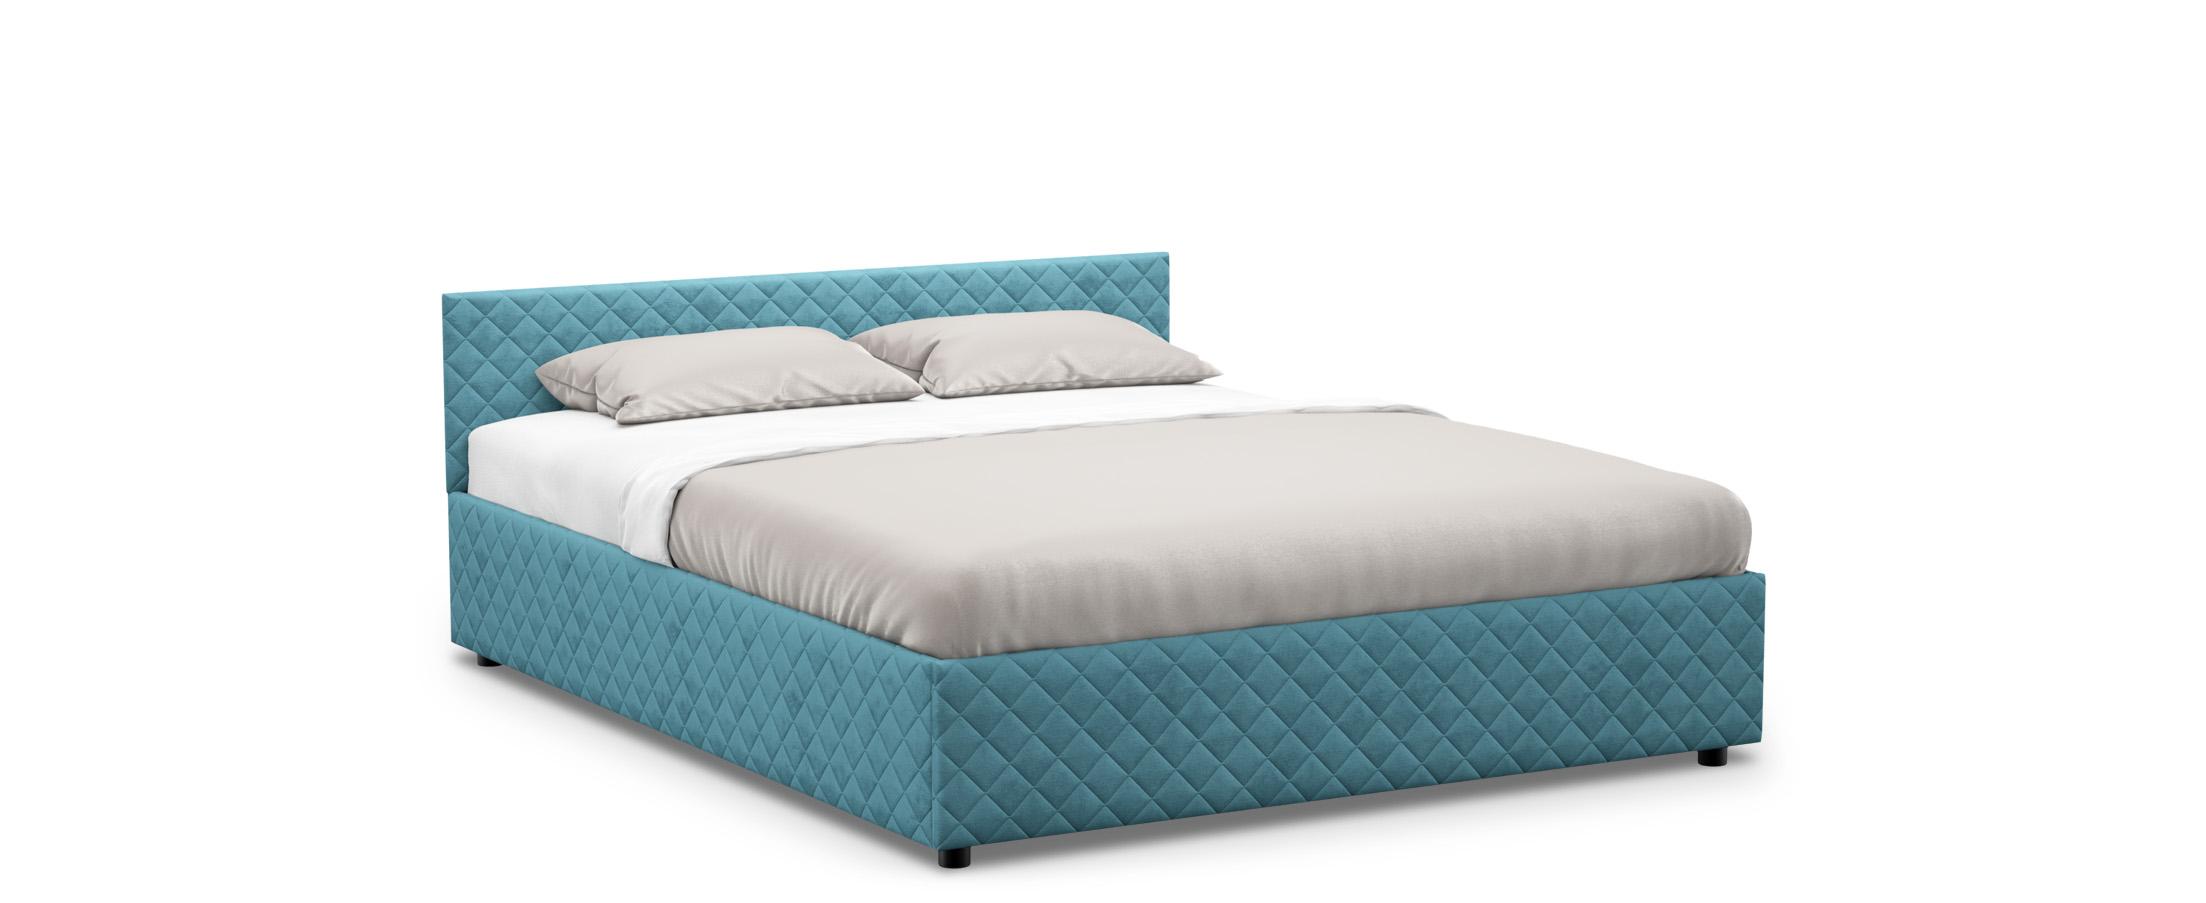 Кровать двуспальная Prima Style New 140х200 Модель 1221 фото